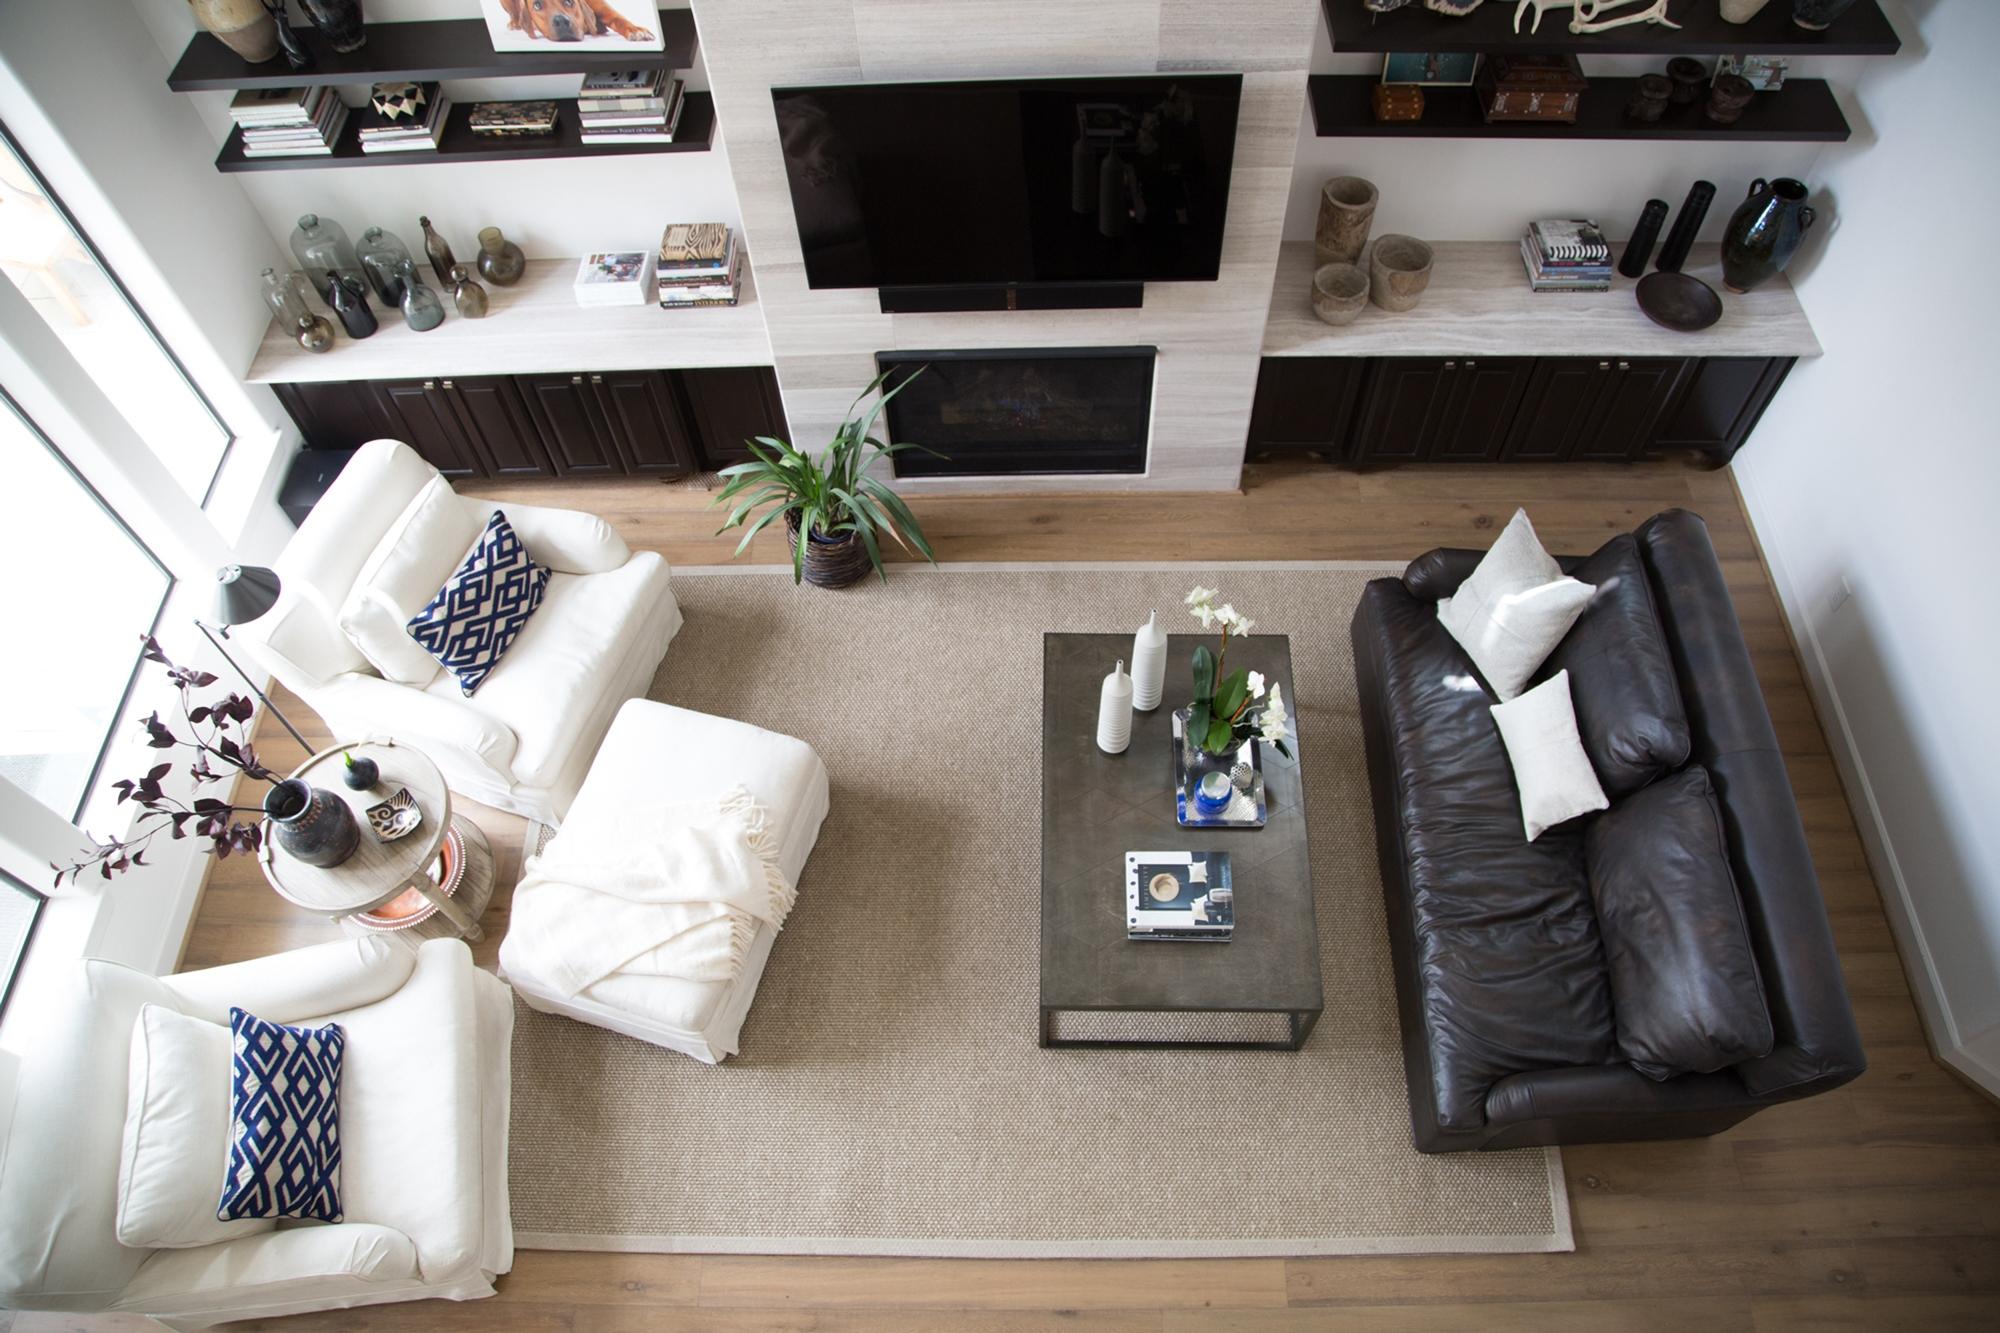 living room remodel; chair; Ottomans; leather sofa; shelving; fireplace; coffee table | Interior Designer: Carla Aston / Photographer: Tori Aston